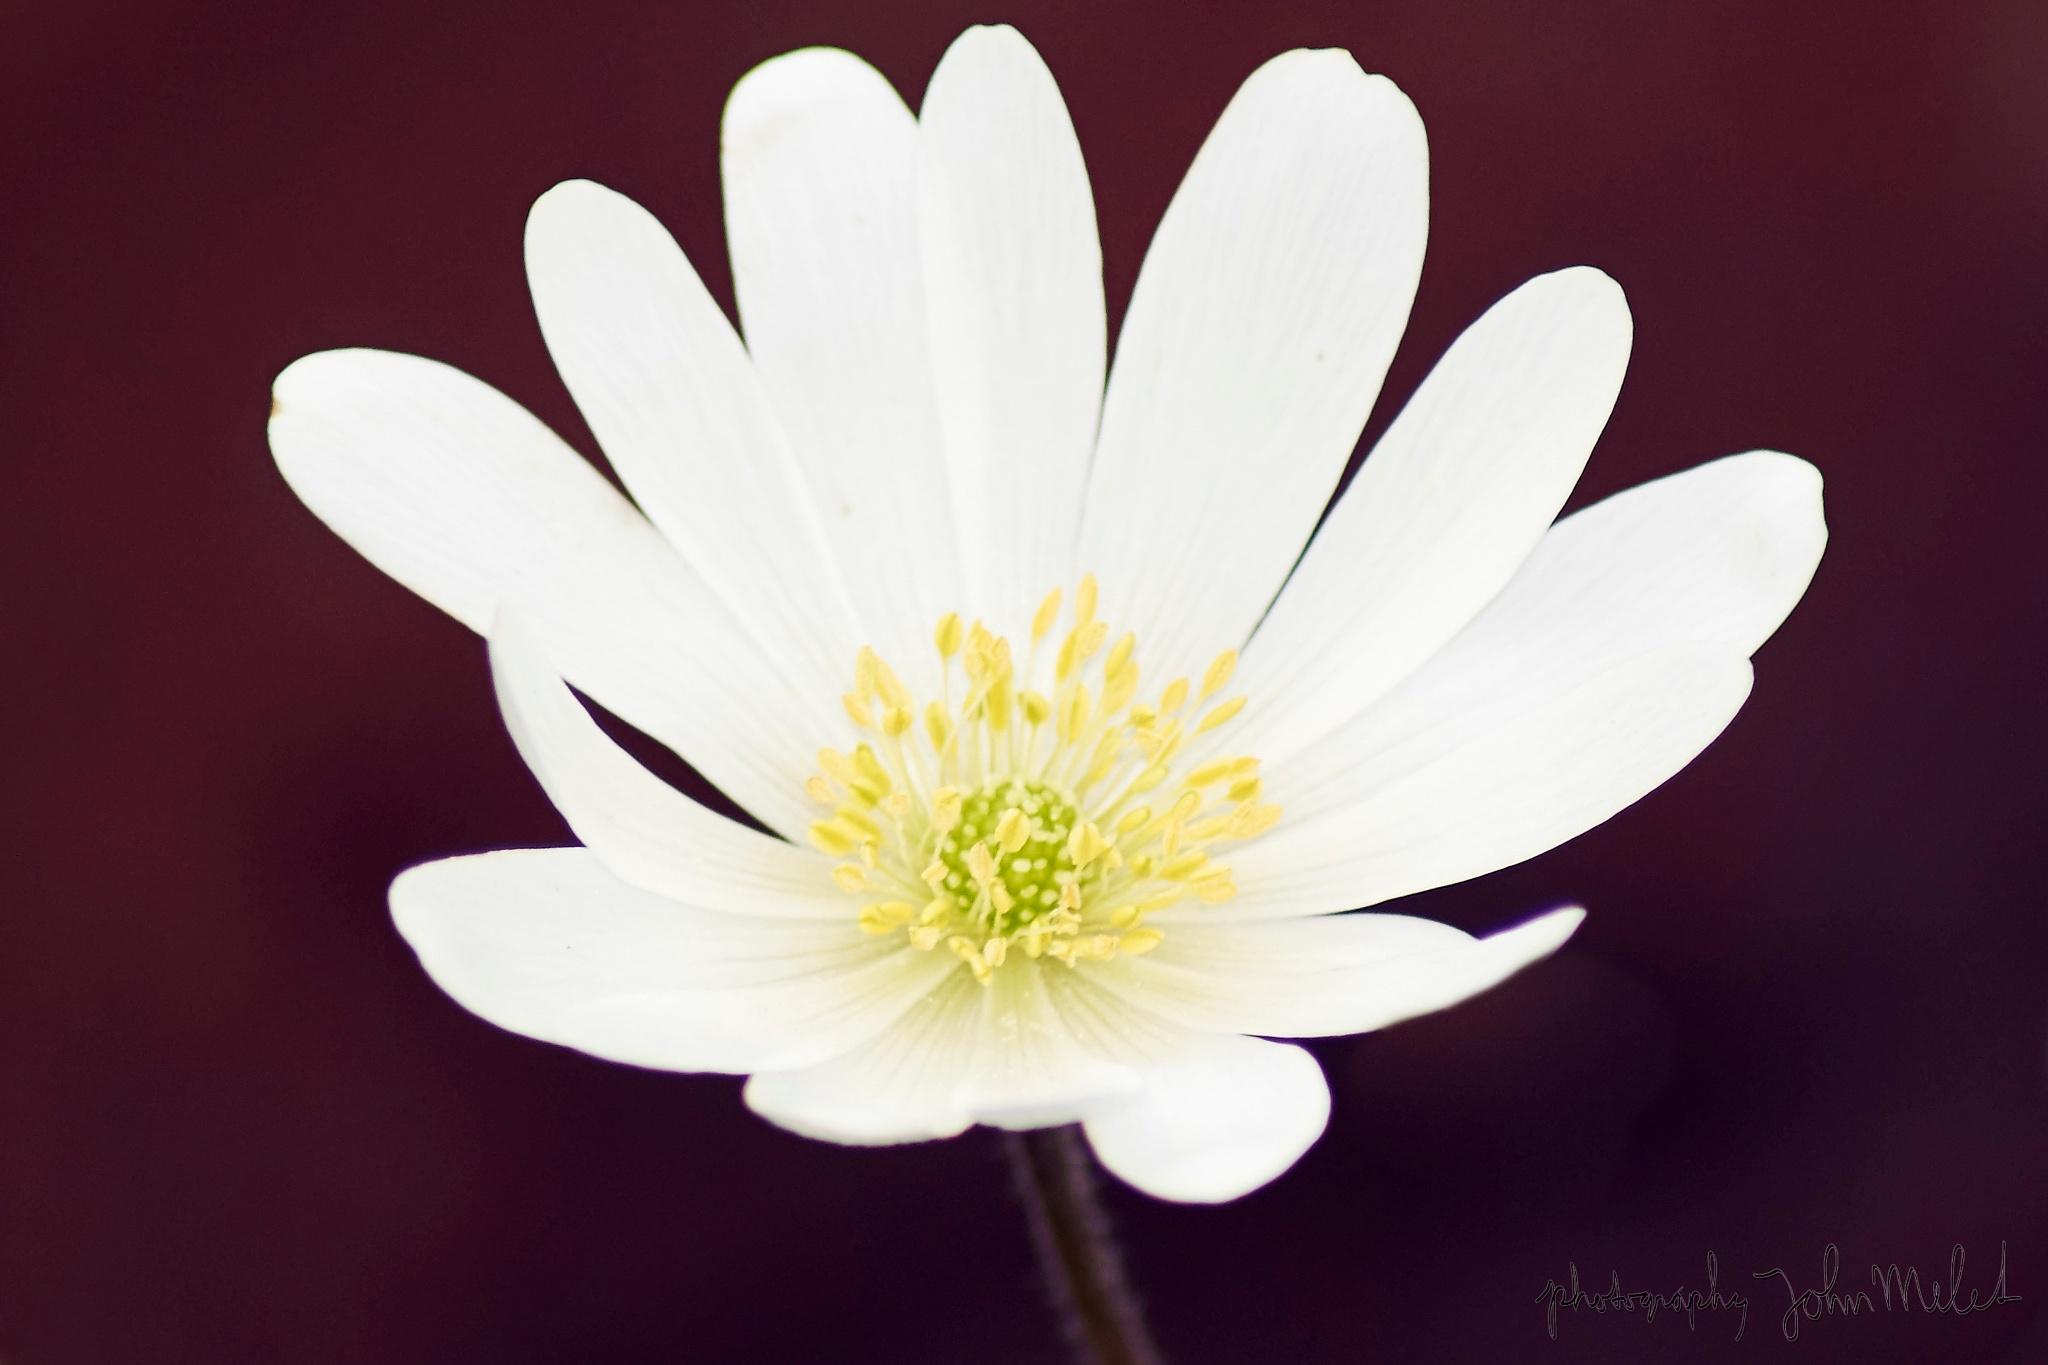 Anemone by John Melet